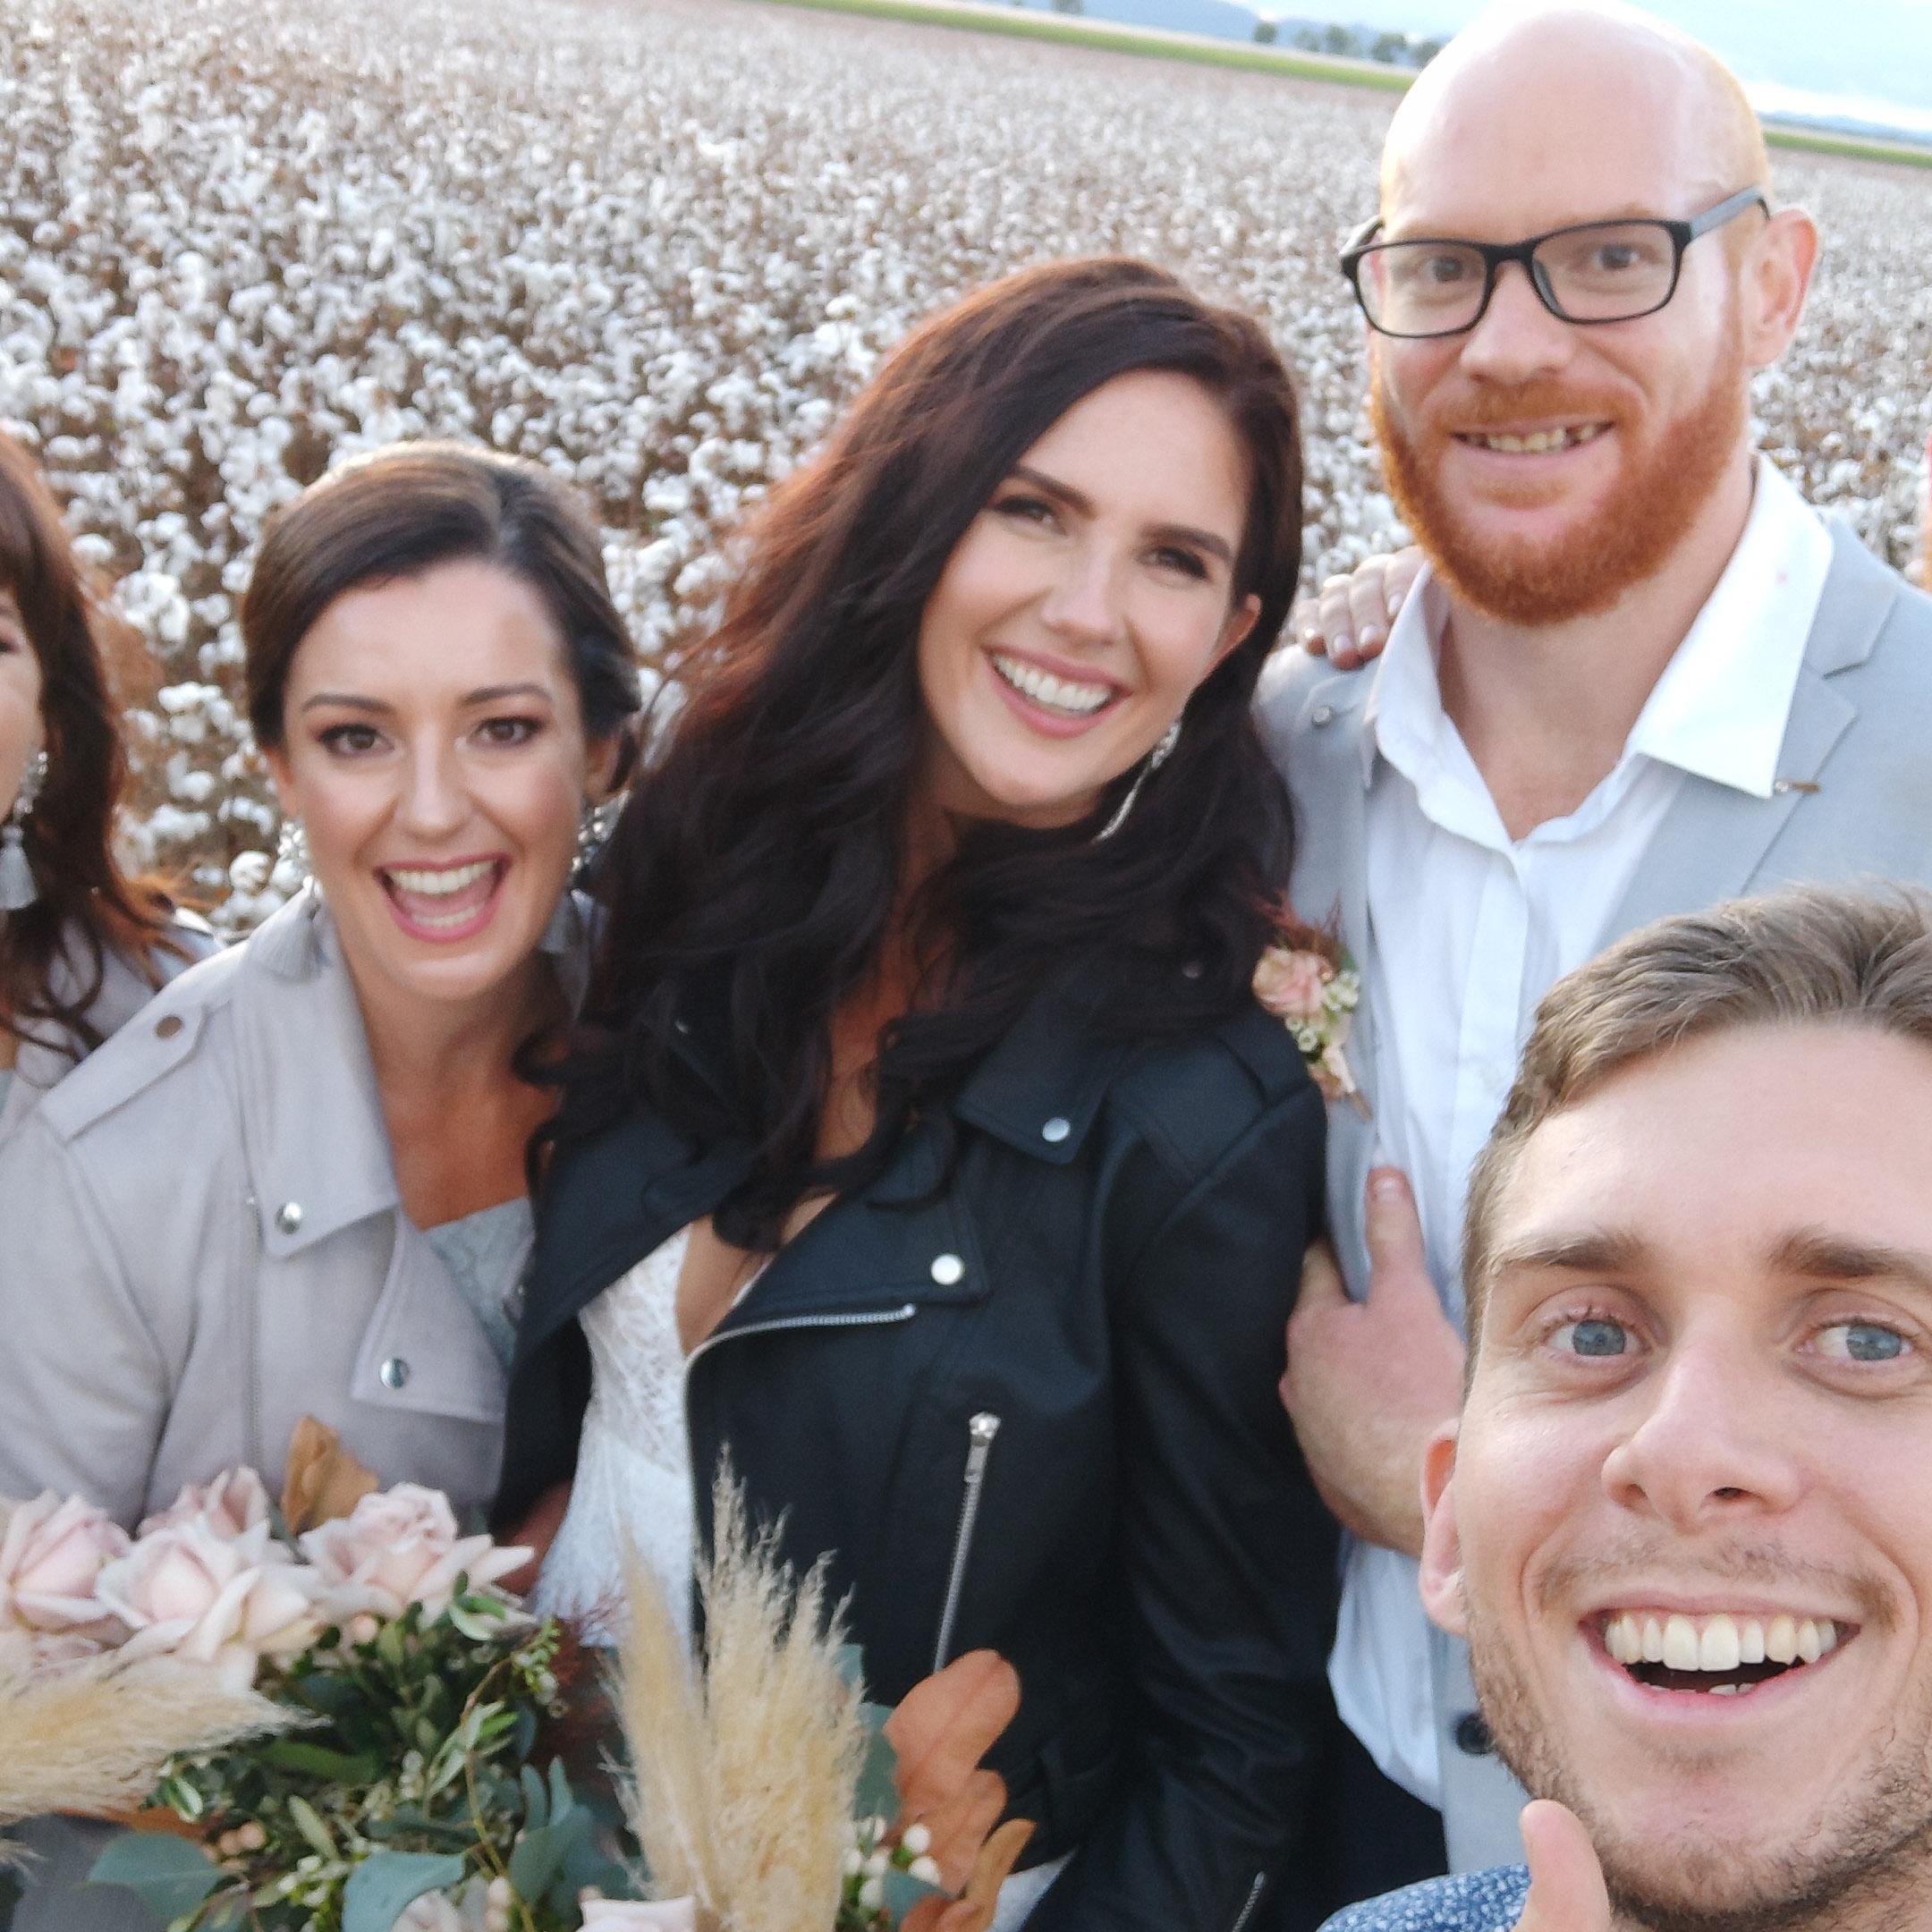 The-raw-photographer-cairns-wedding-photography-bridalparty-selfie-12.jpg